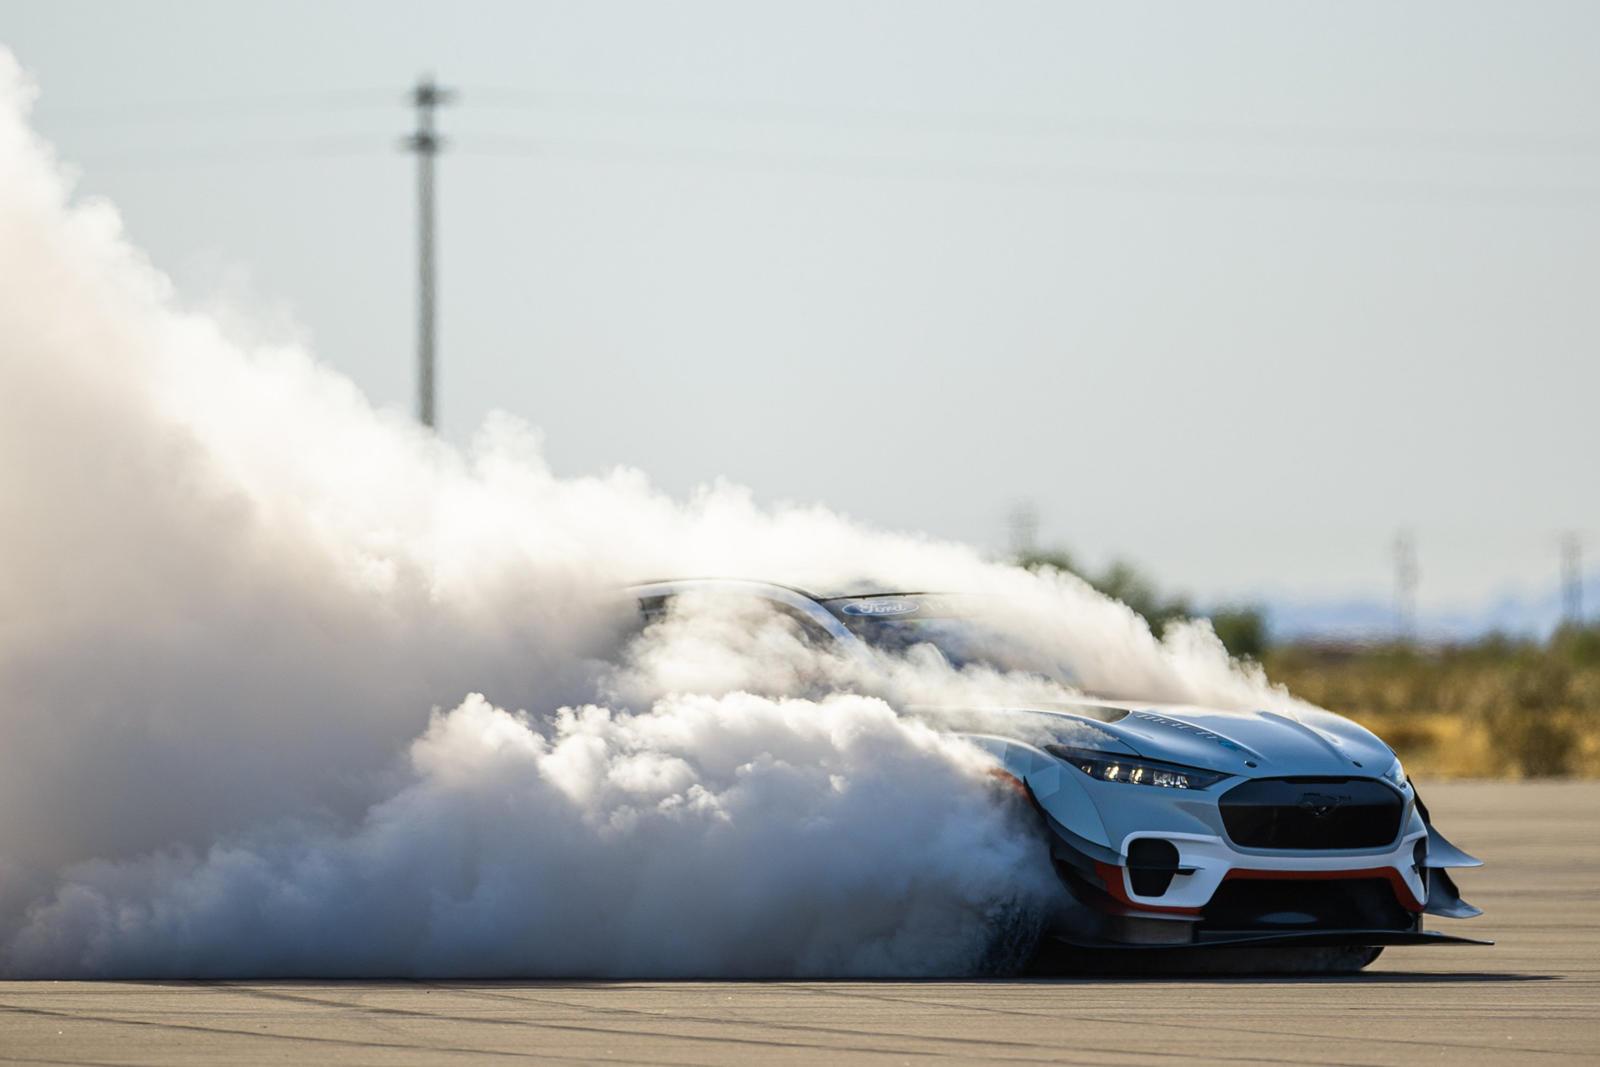 Ford Teases An Insane New Mustang Mach-E thumbnail